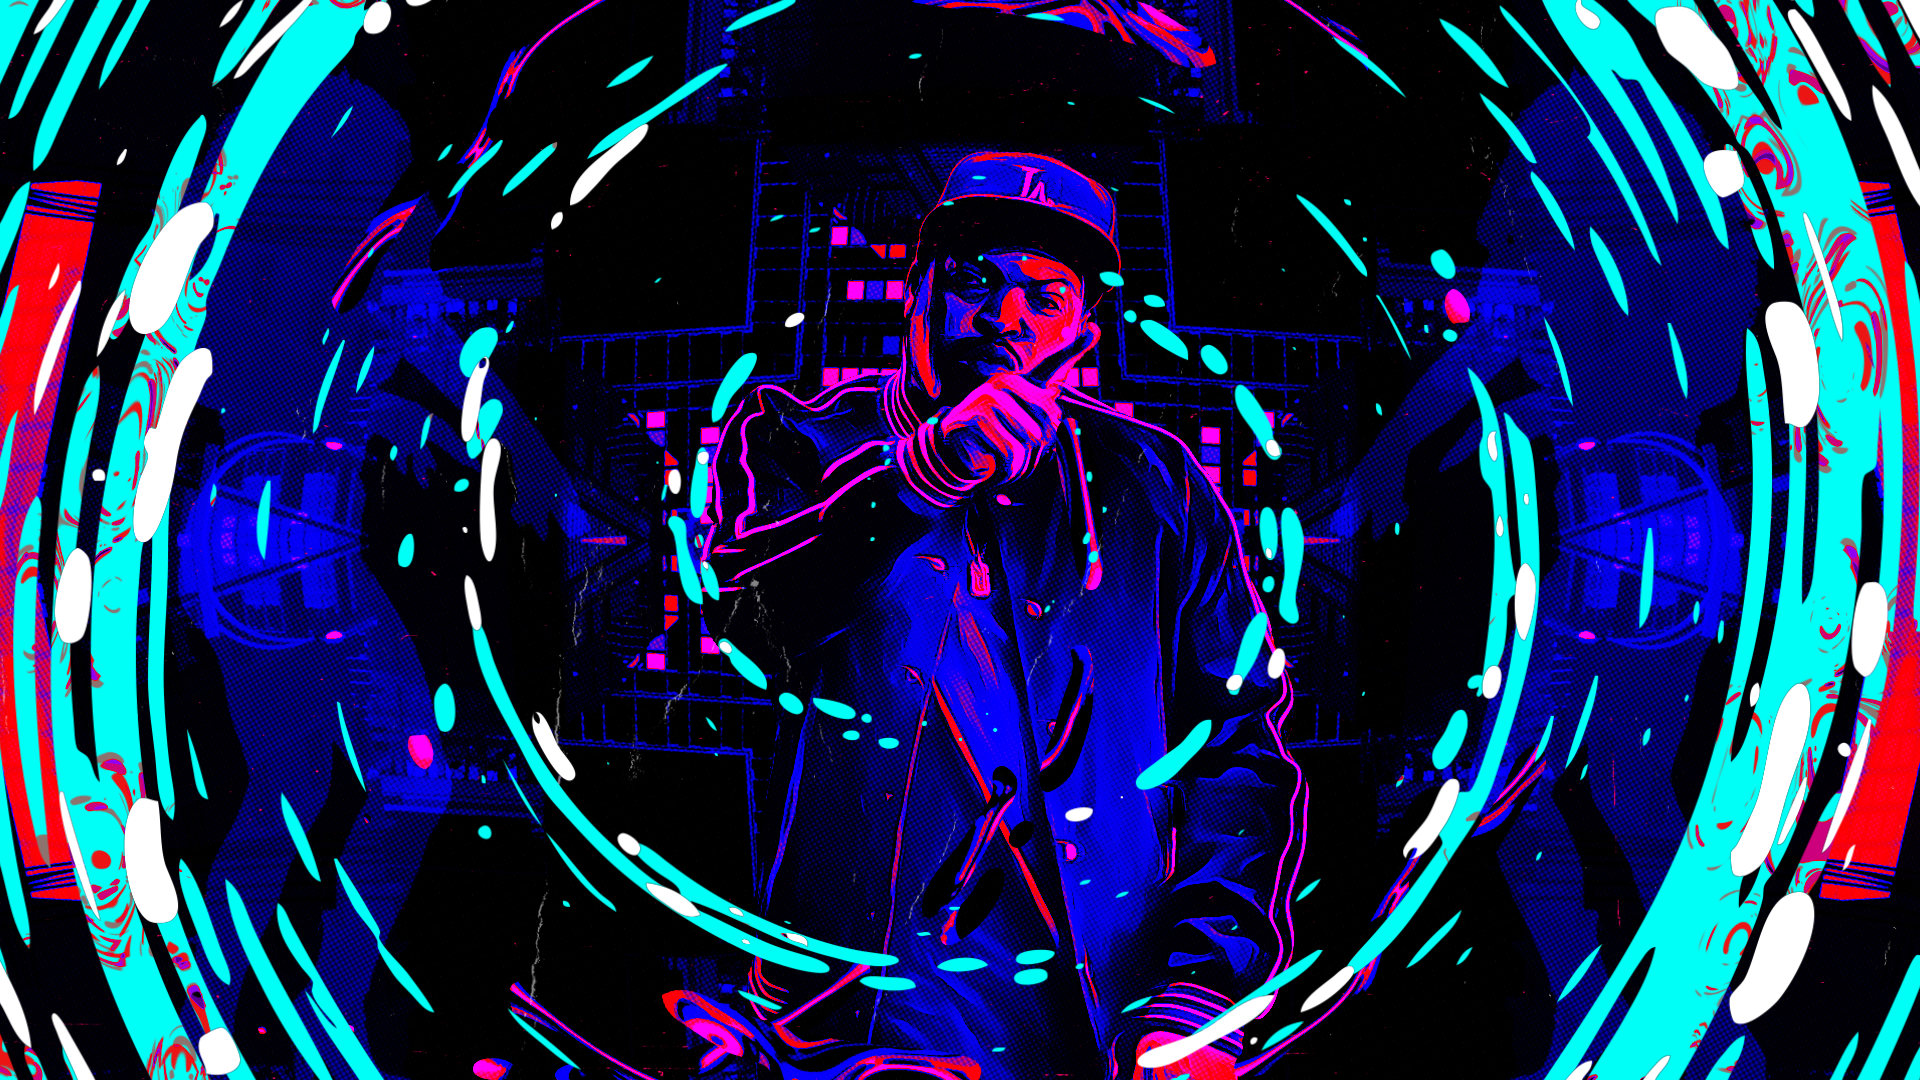 ice-cube-funkadelic-psychedelic-animation-06.png